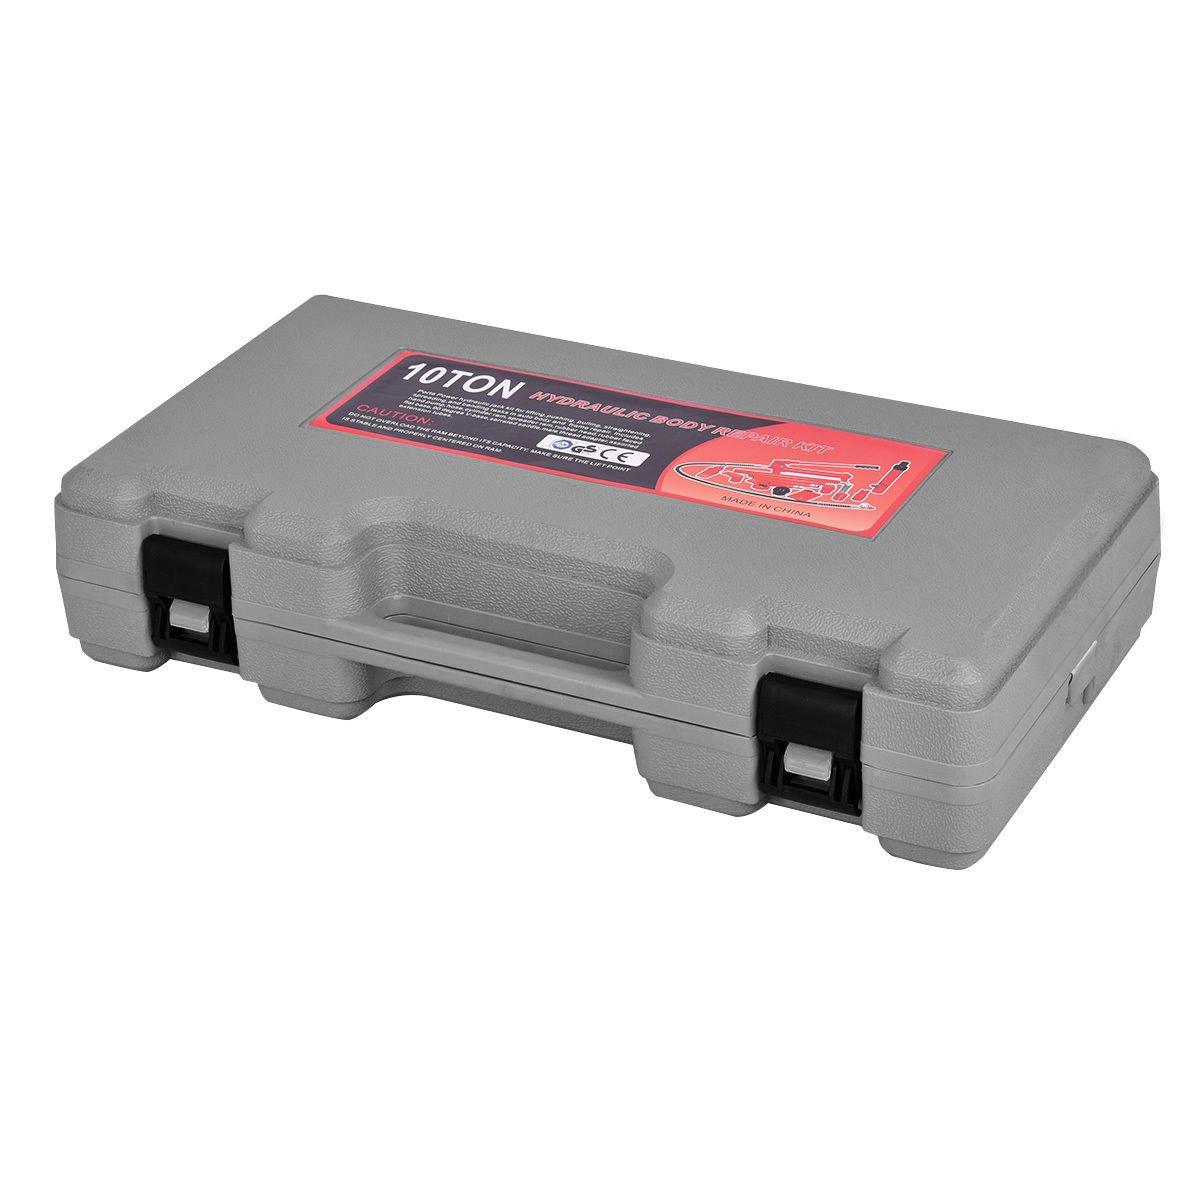 Goplus Porta Power Hydraulic Jack Auto Body Frame Repair Kit Shop Tool Lift Ram w/Carrying Case, 10 Ton Capacity by Goplus (Image #5)